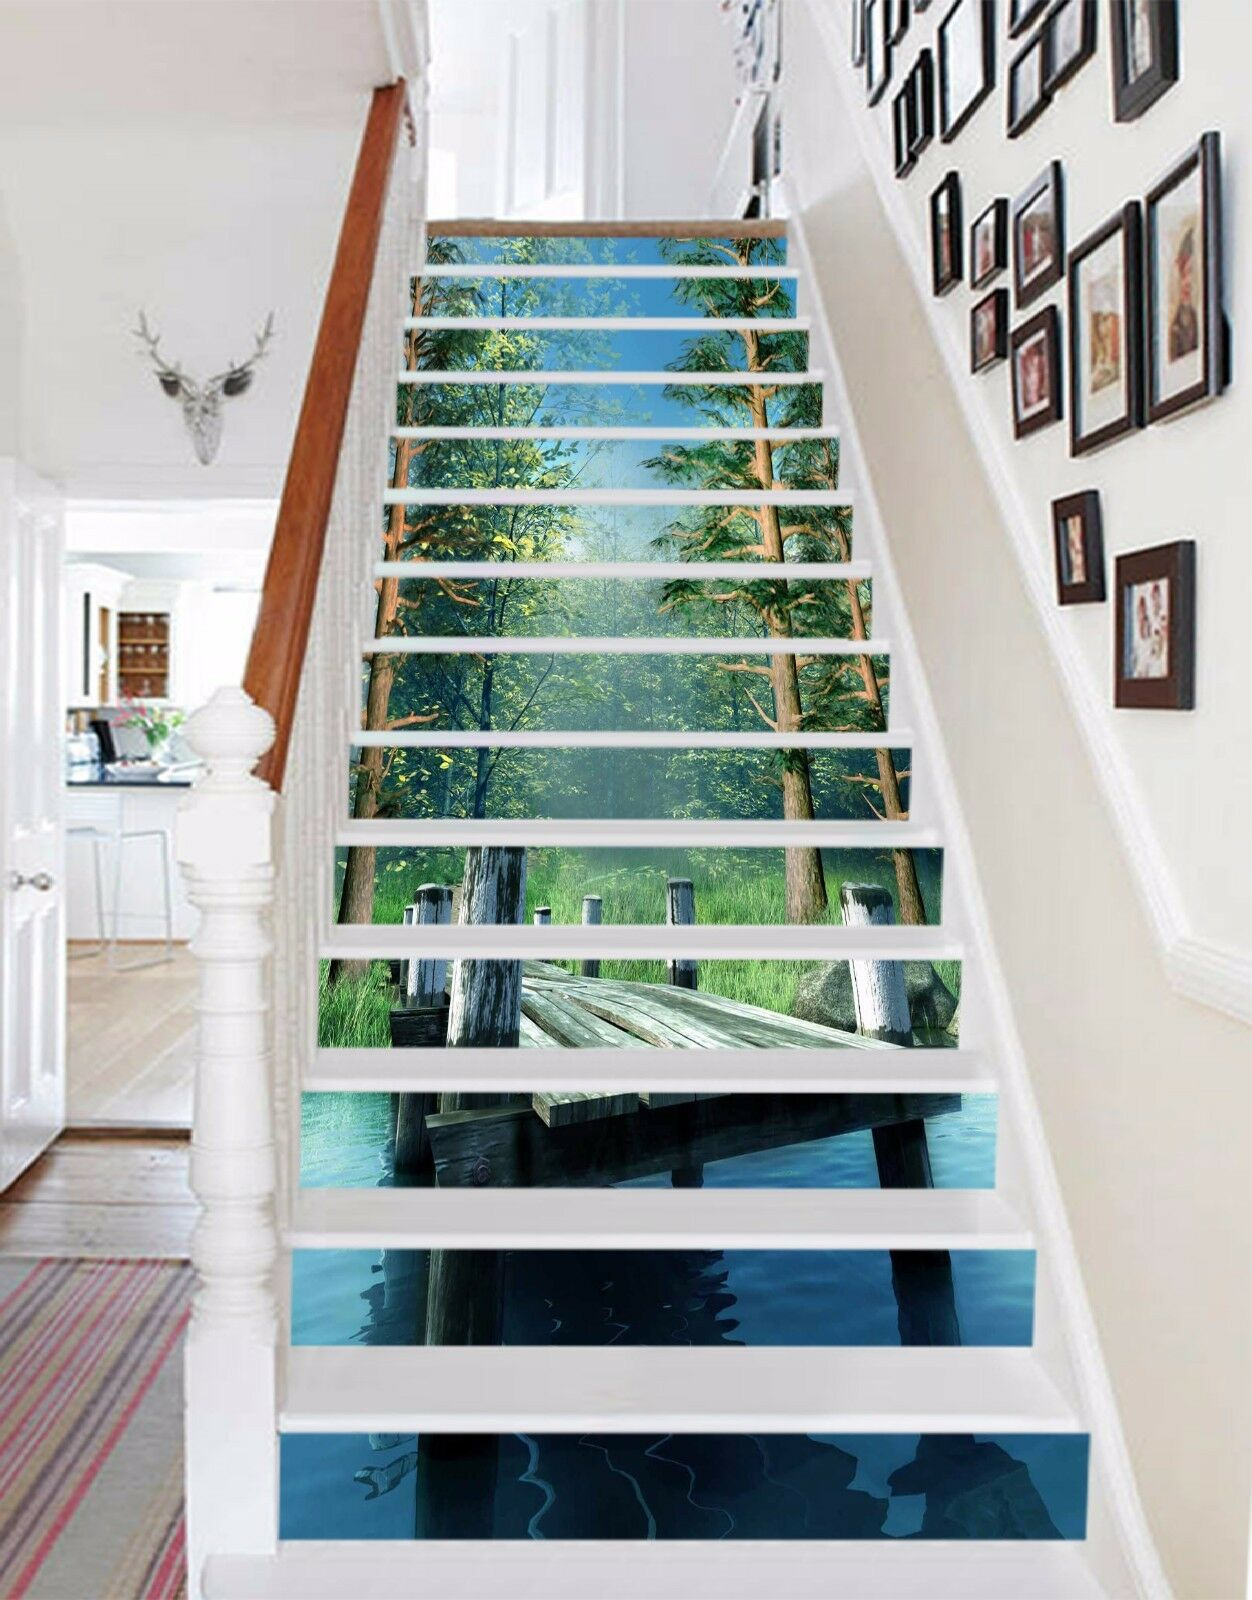 3D Woods Road 5 Stair Risers Decoration Photo Mural Vinyl Decal Wallpaper UK